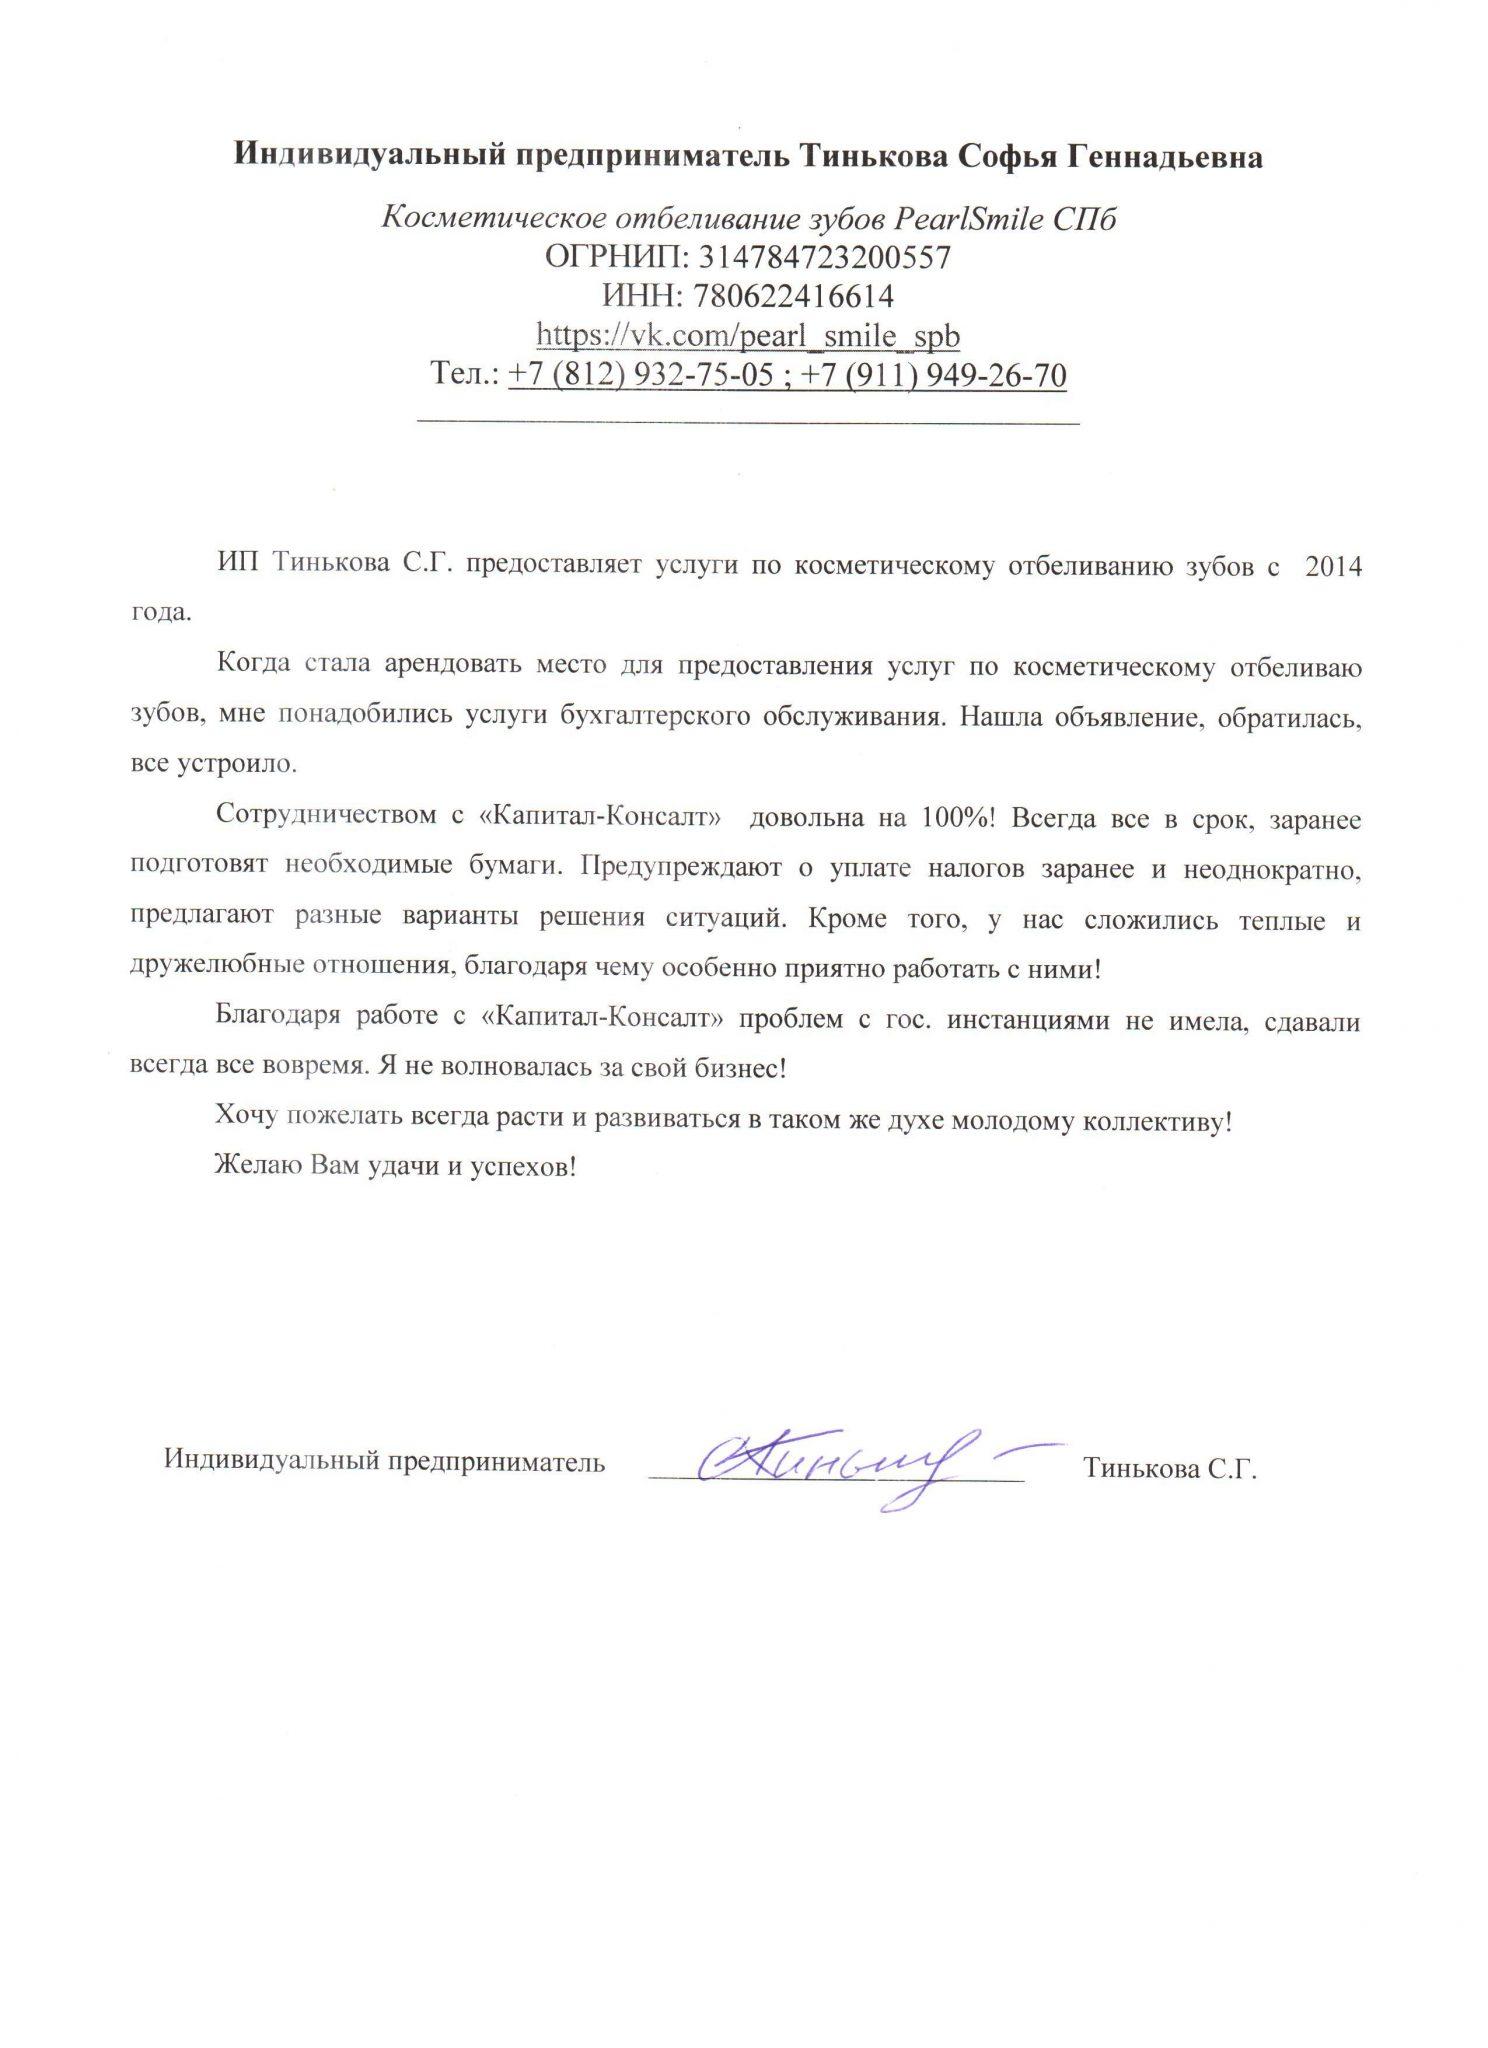 ИП-Тинькова